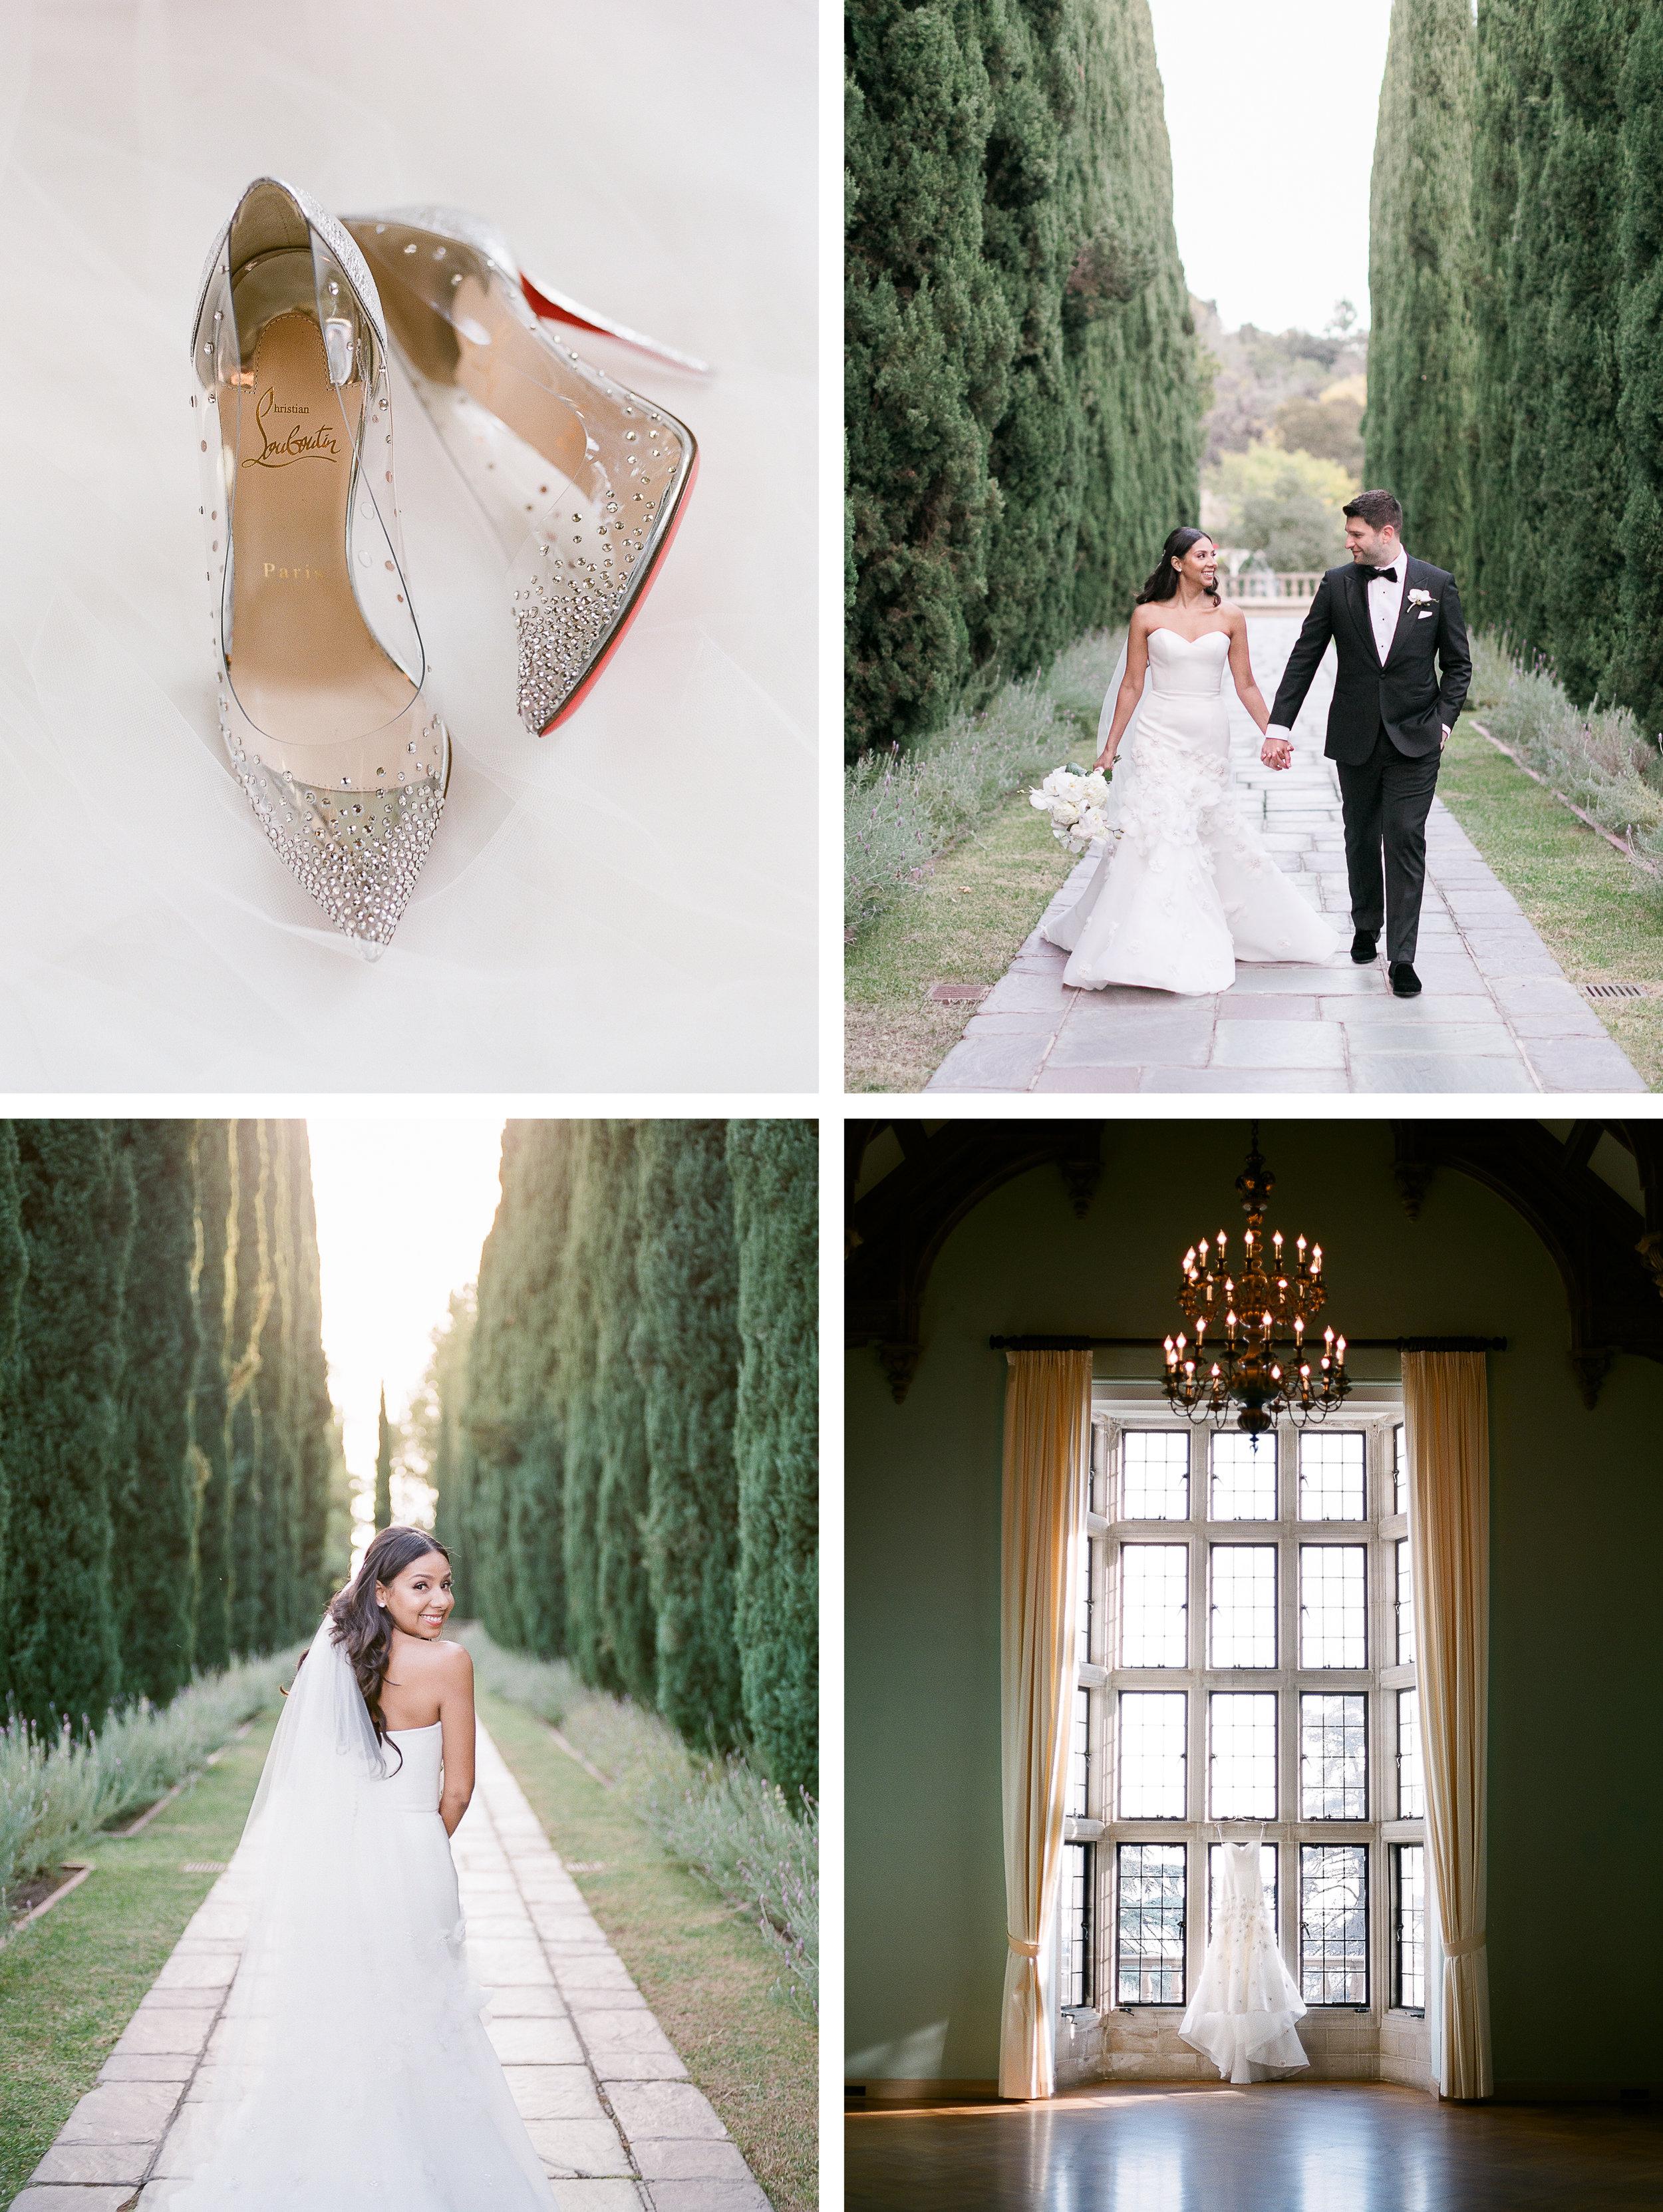 BEVERLY HILLS WEDDING AT GREYSTONE MANSION - Patti + mario